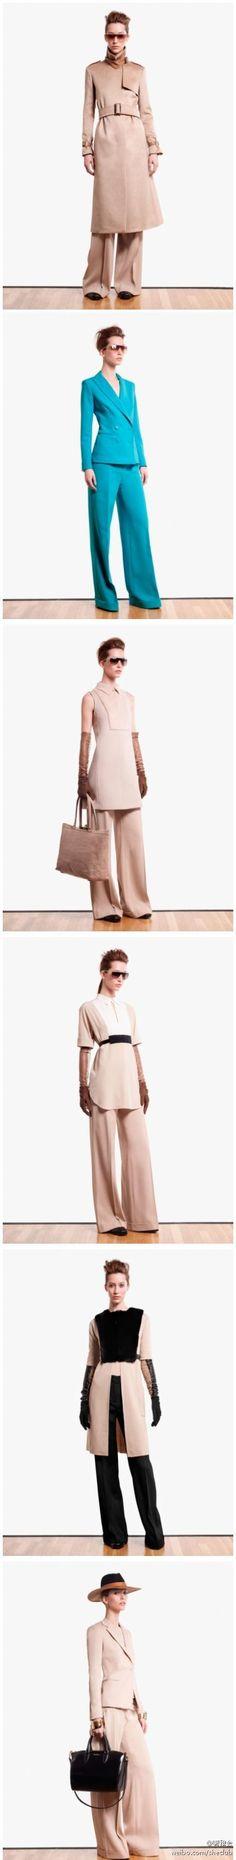 Pre-FallL 2013 Lookbook┃Max Mara Showcases Oversized Elegance for its Pre-Fall 2013 Collection